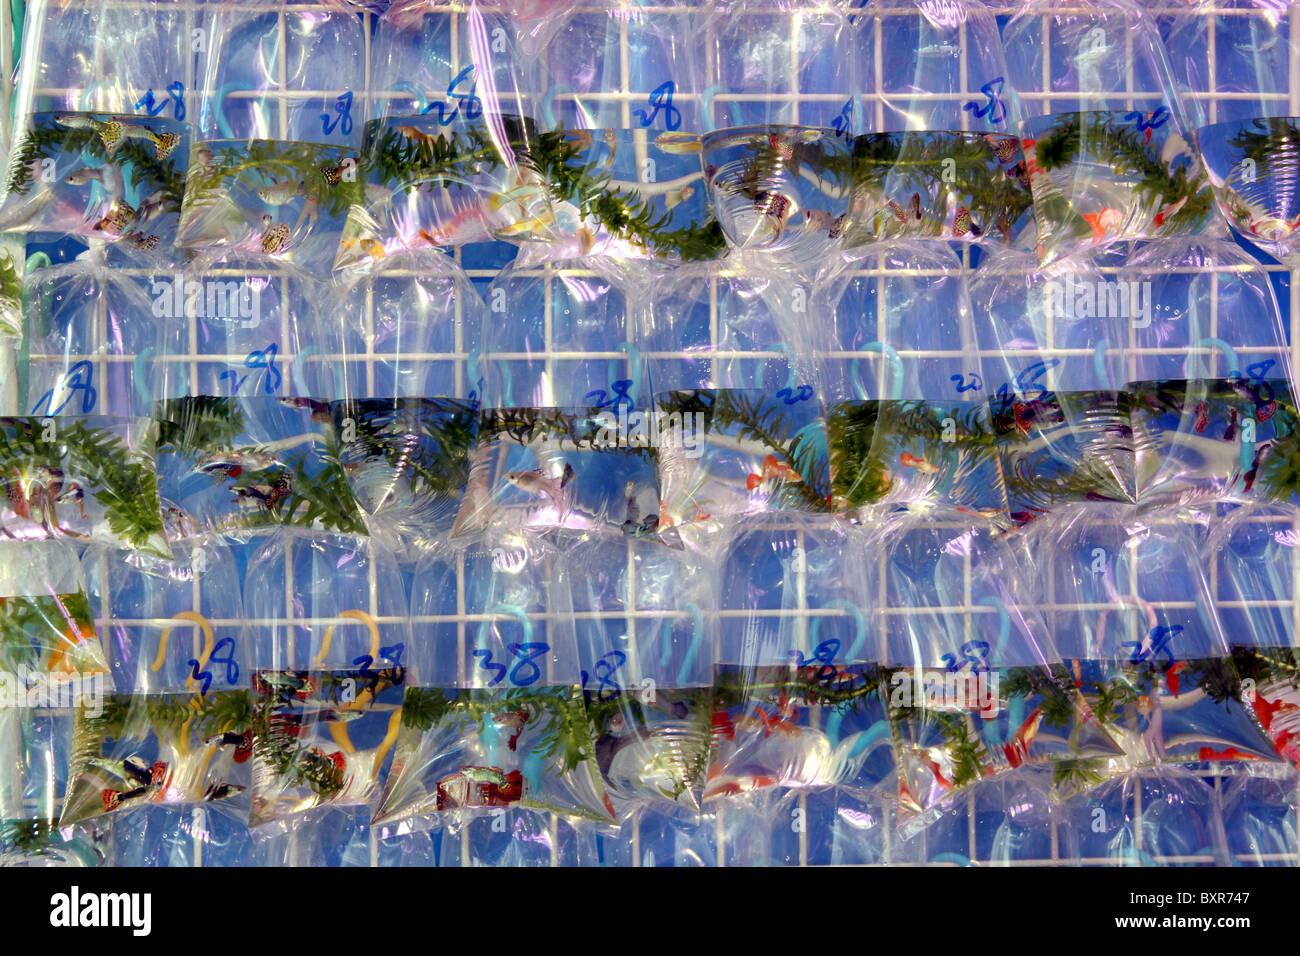 Aquarium pet shop selling goldfish in plastic bags in the for The fish shop